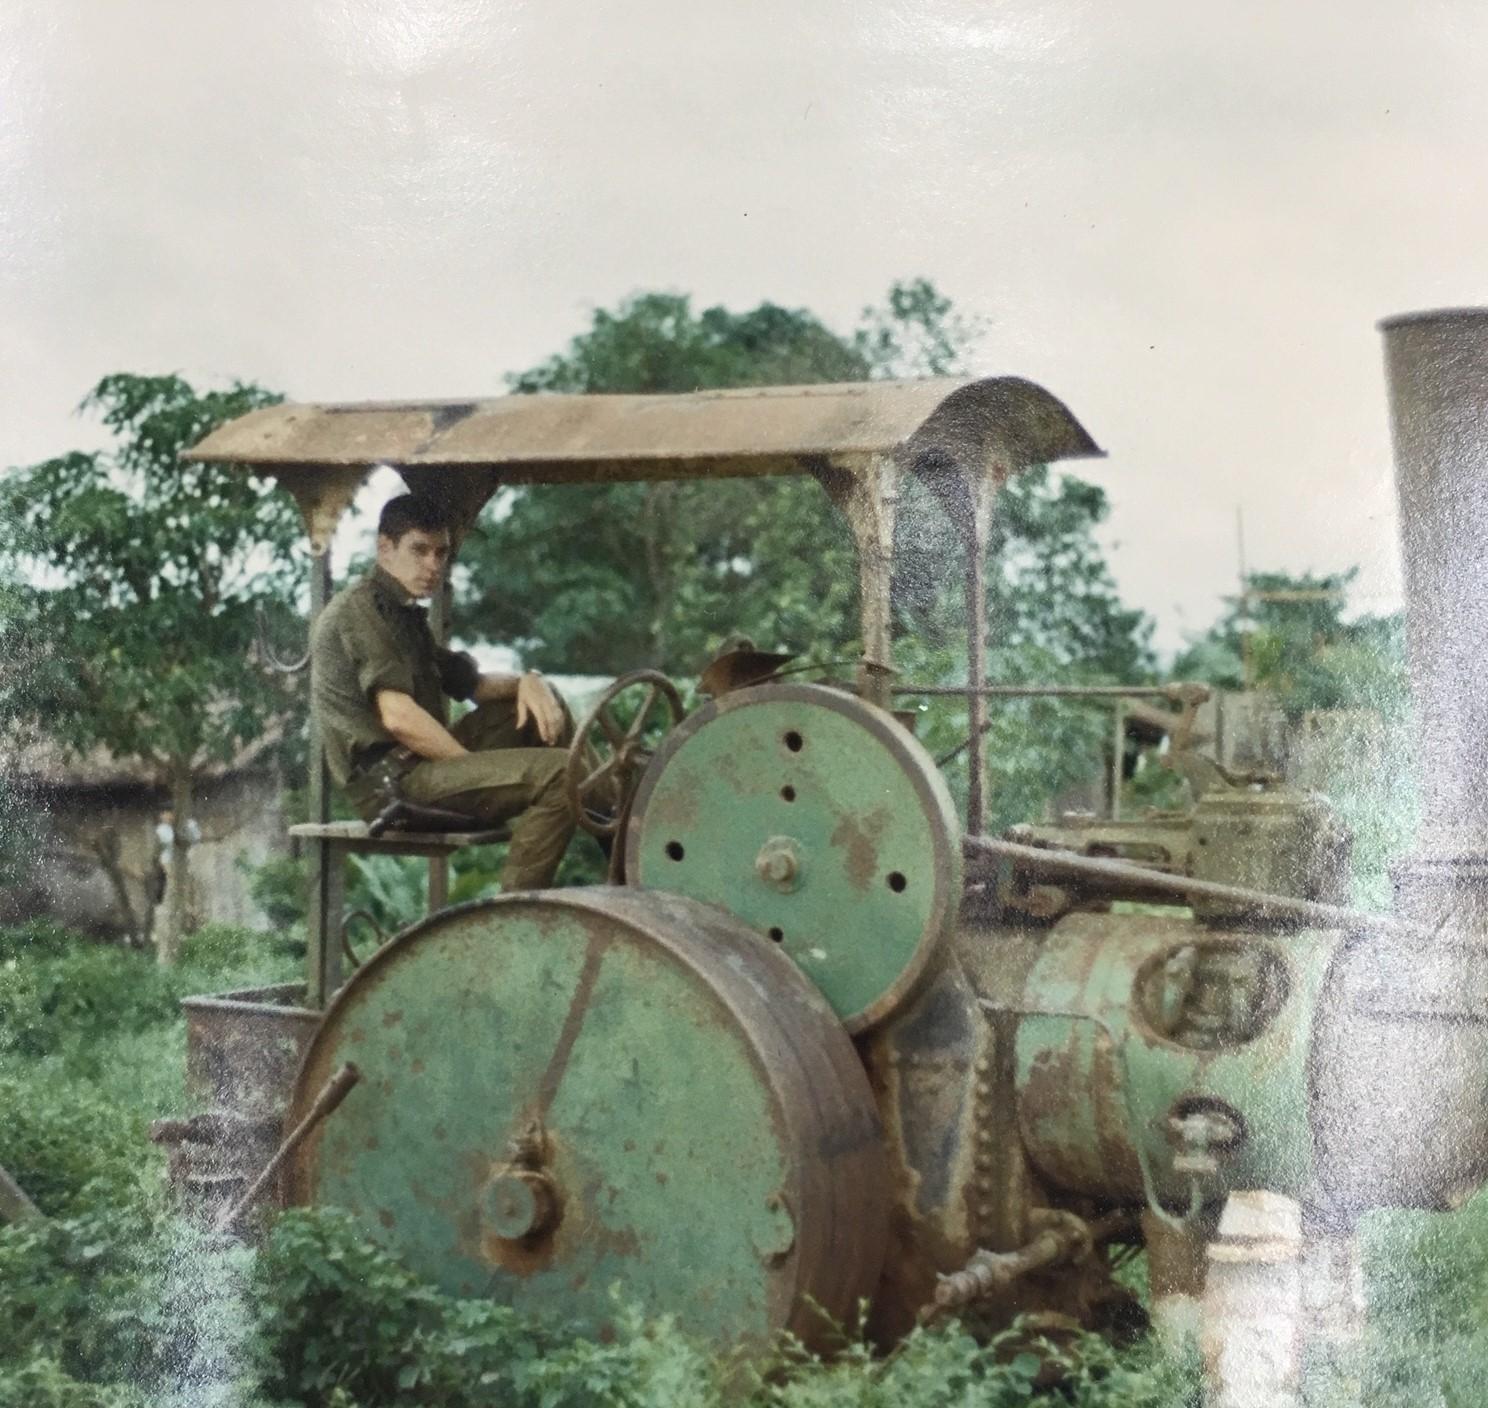 Scott Alwin on Vietnamese farming machin